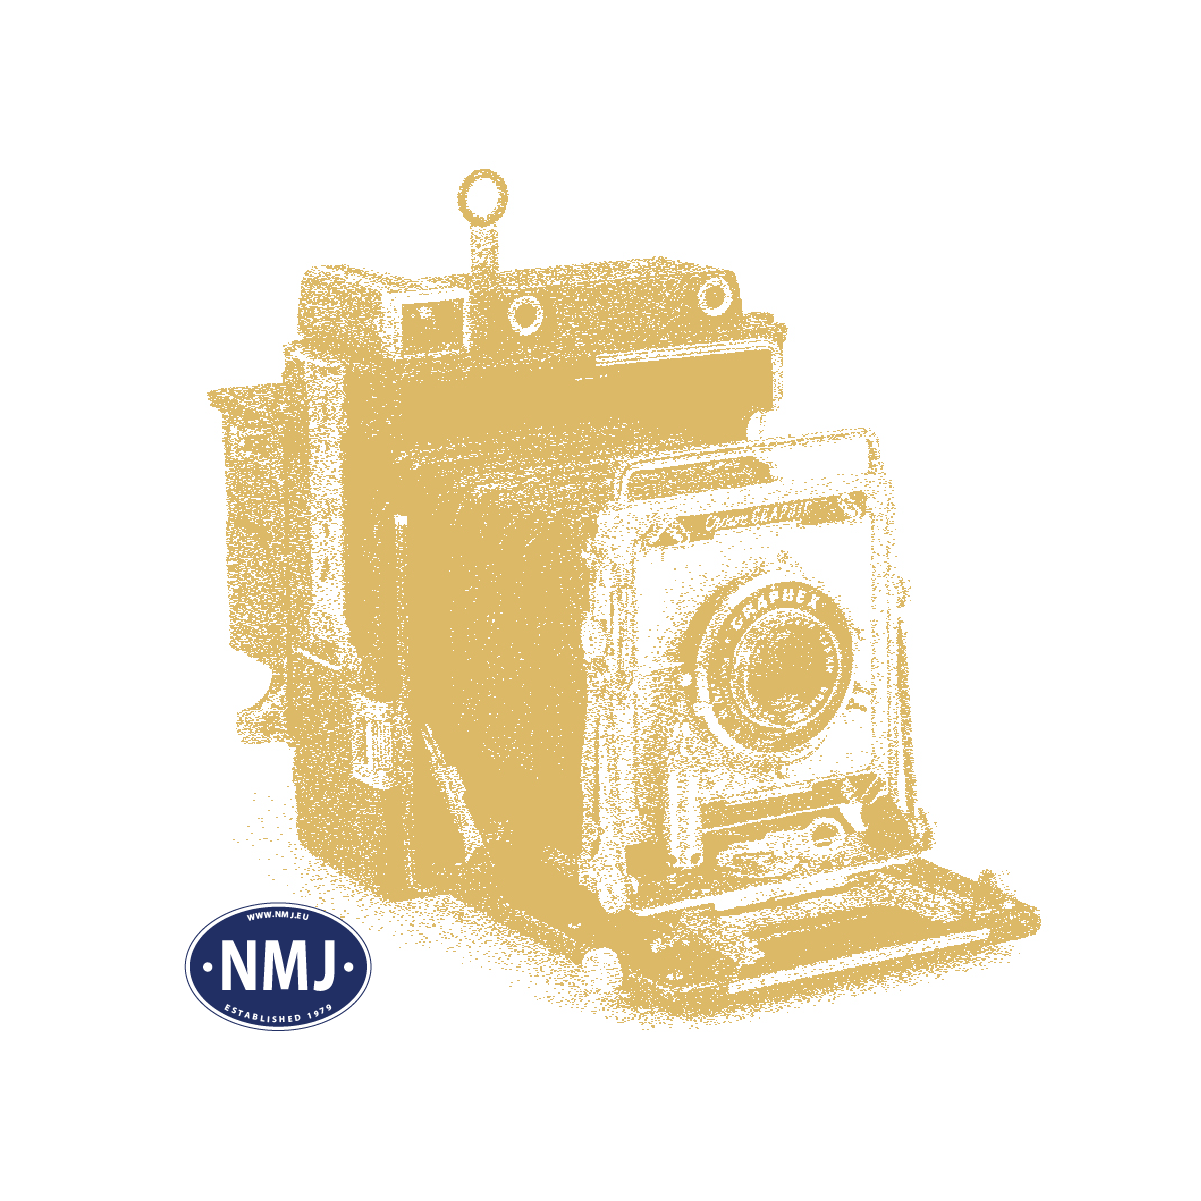 NMJT201.401 - NMJ Topline SJ A2.5144 1 Kl. Personvogn, blå/sort design V.2